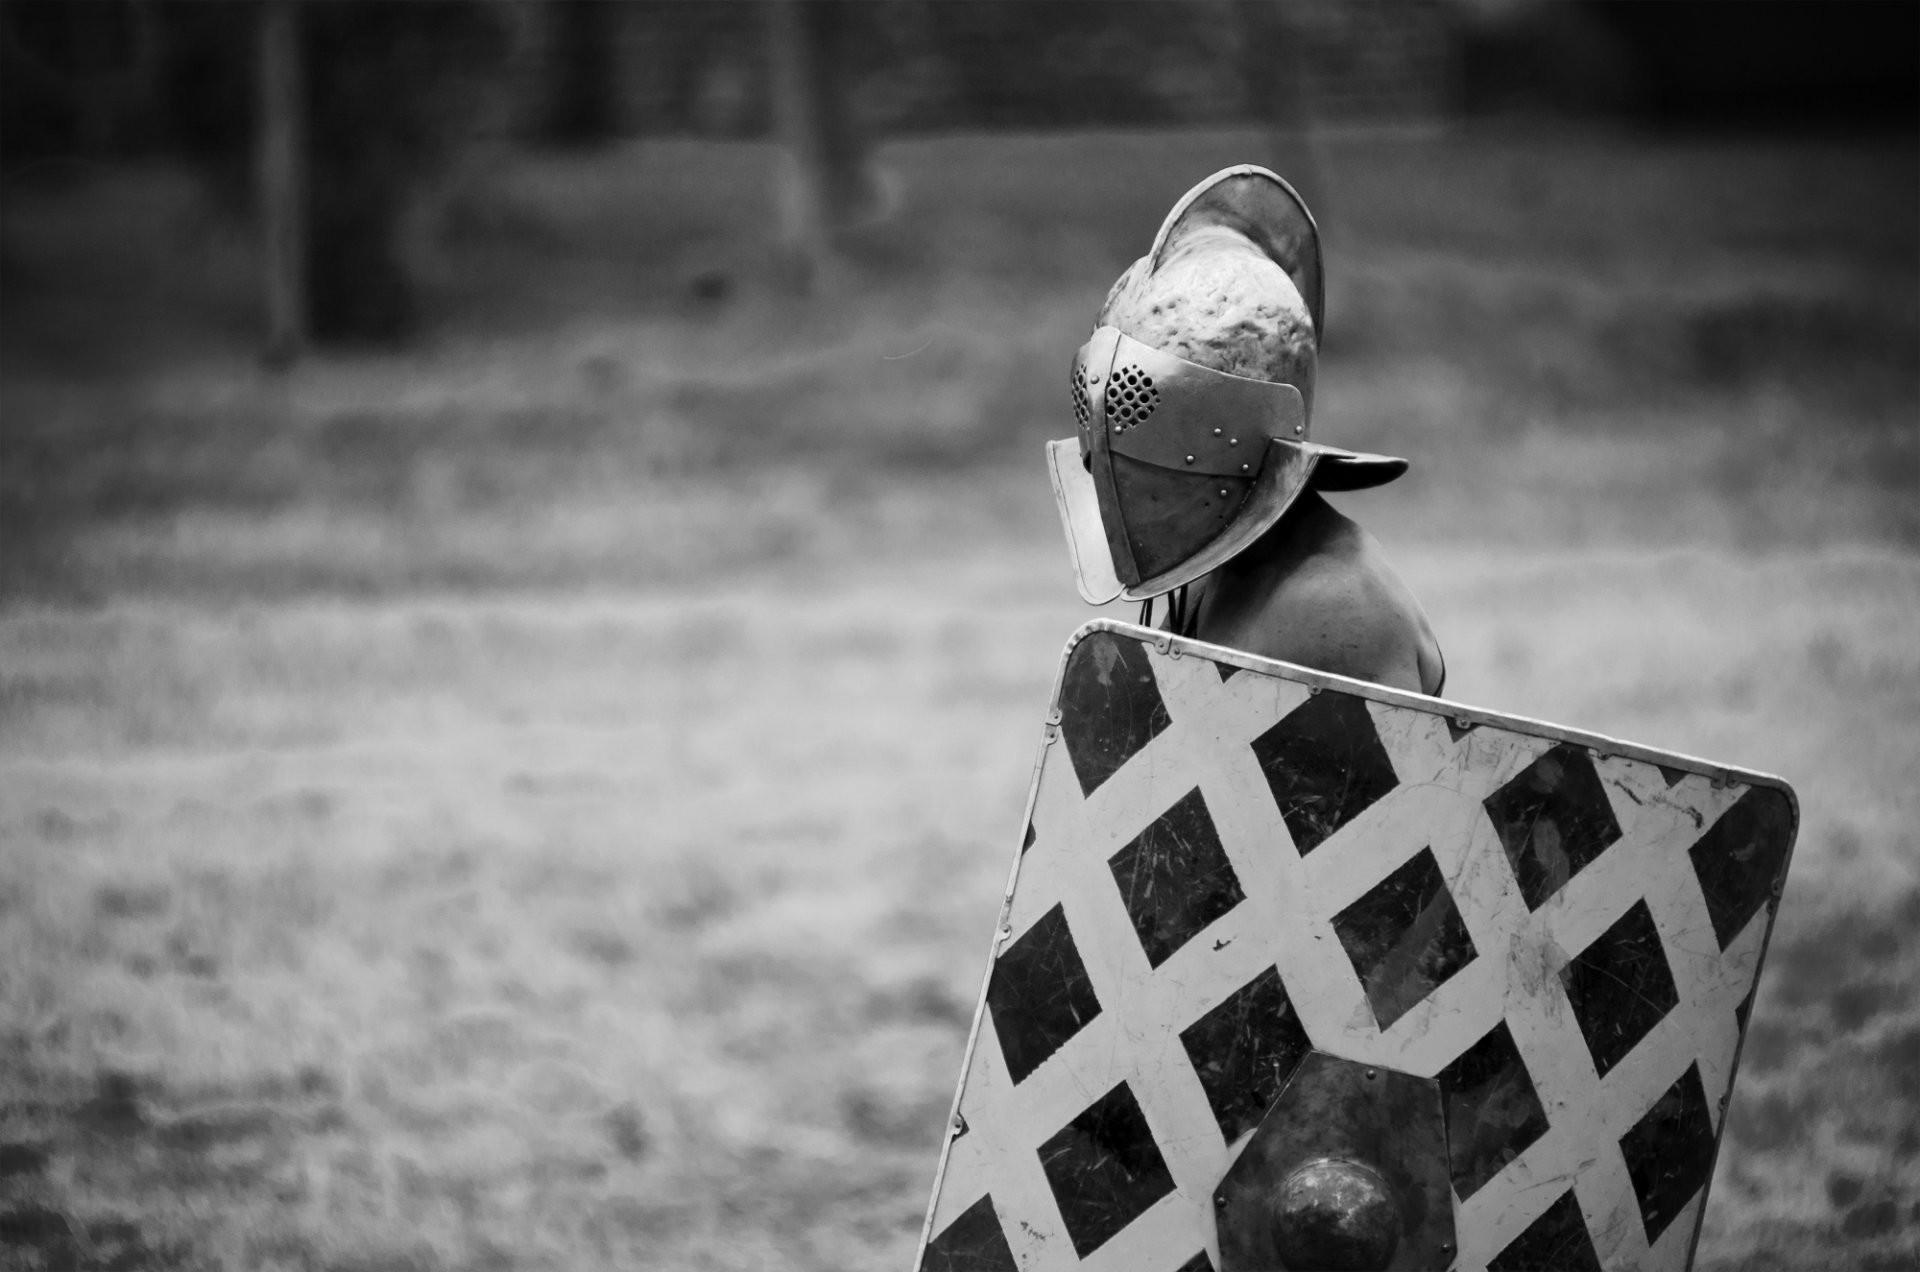 gladiator warrior helmet shield black and white background